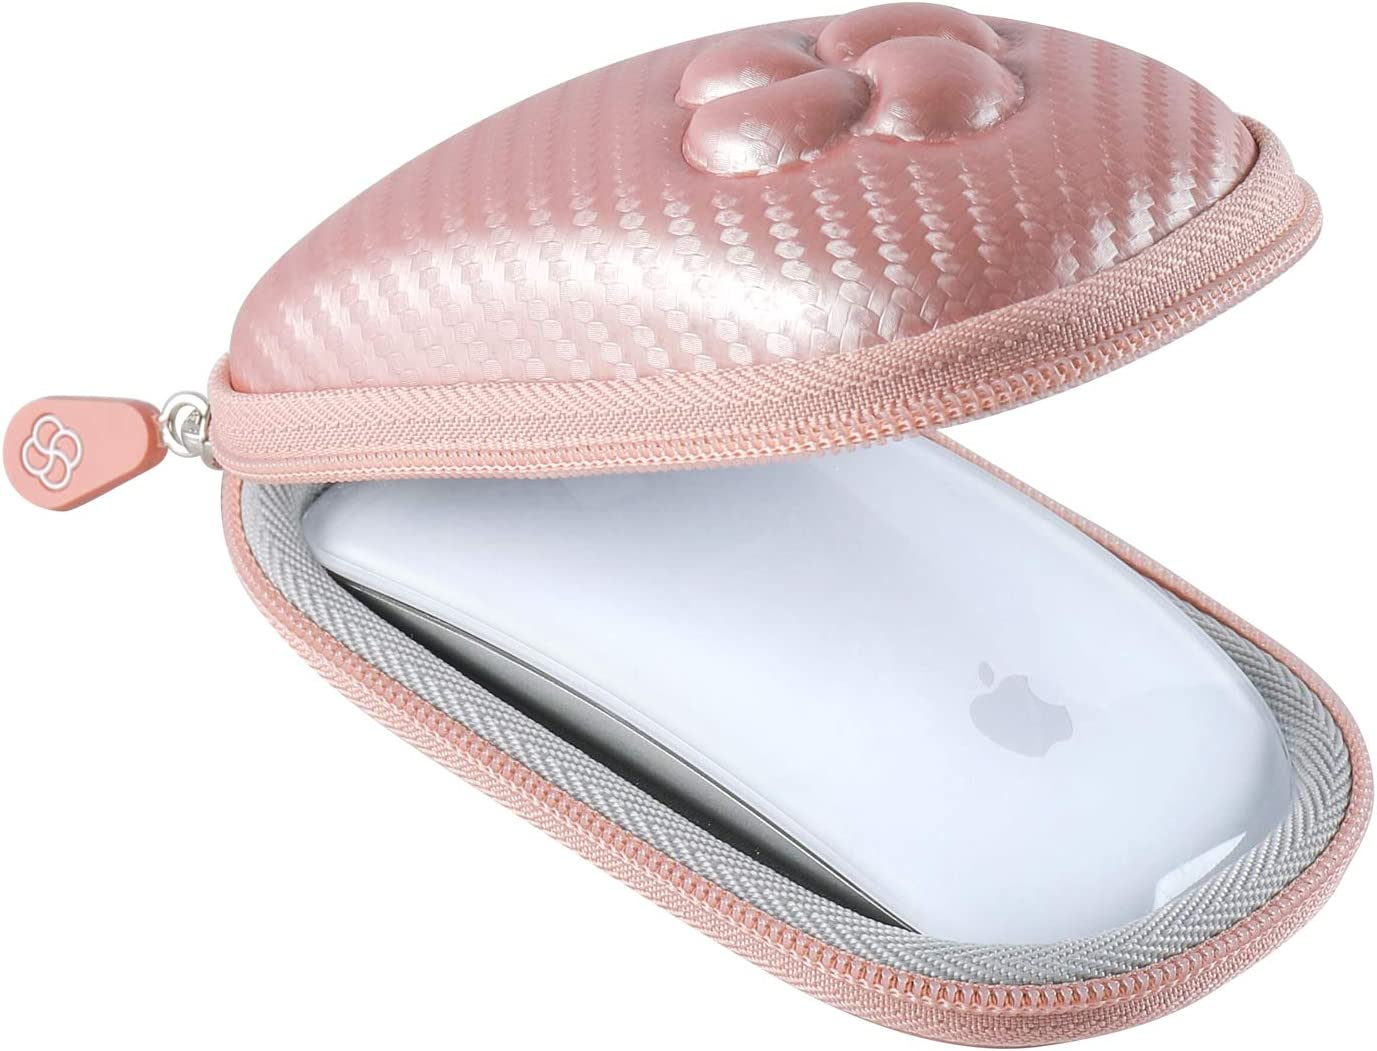 Koonice Hard Case Compatible for Apple Magic Mouse (I and II 2nd Gen) Including Carabiner (Rose Gold)